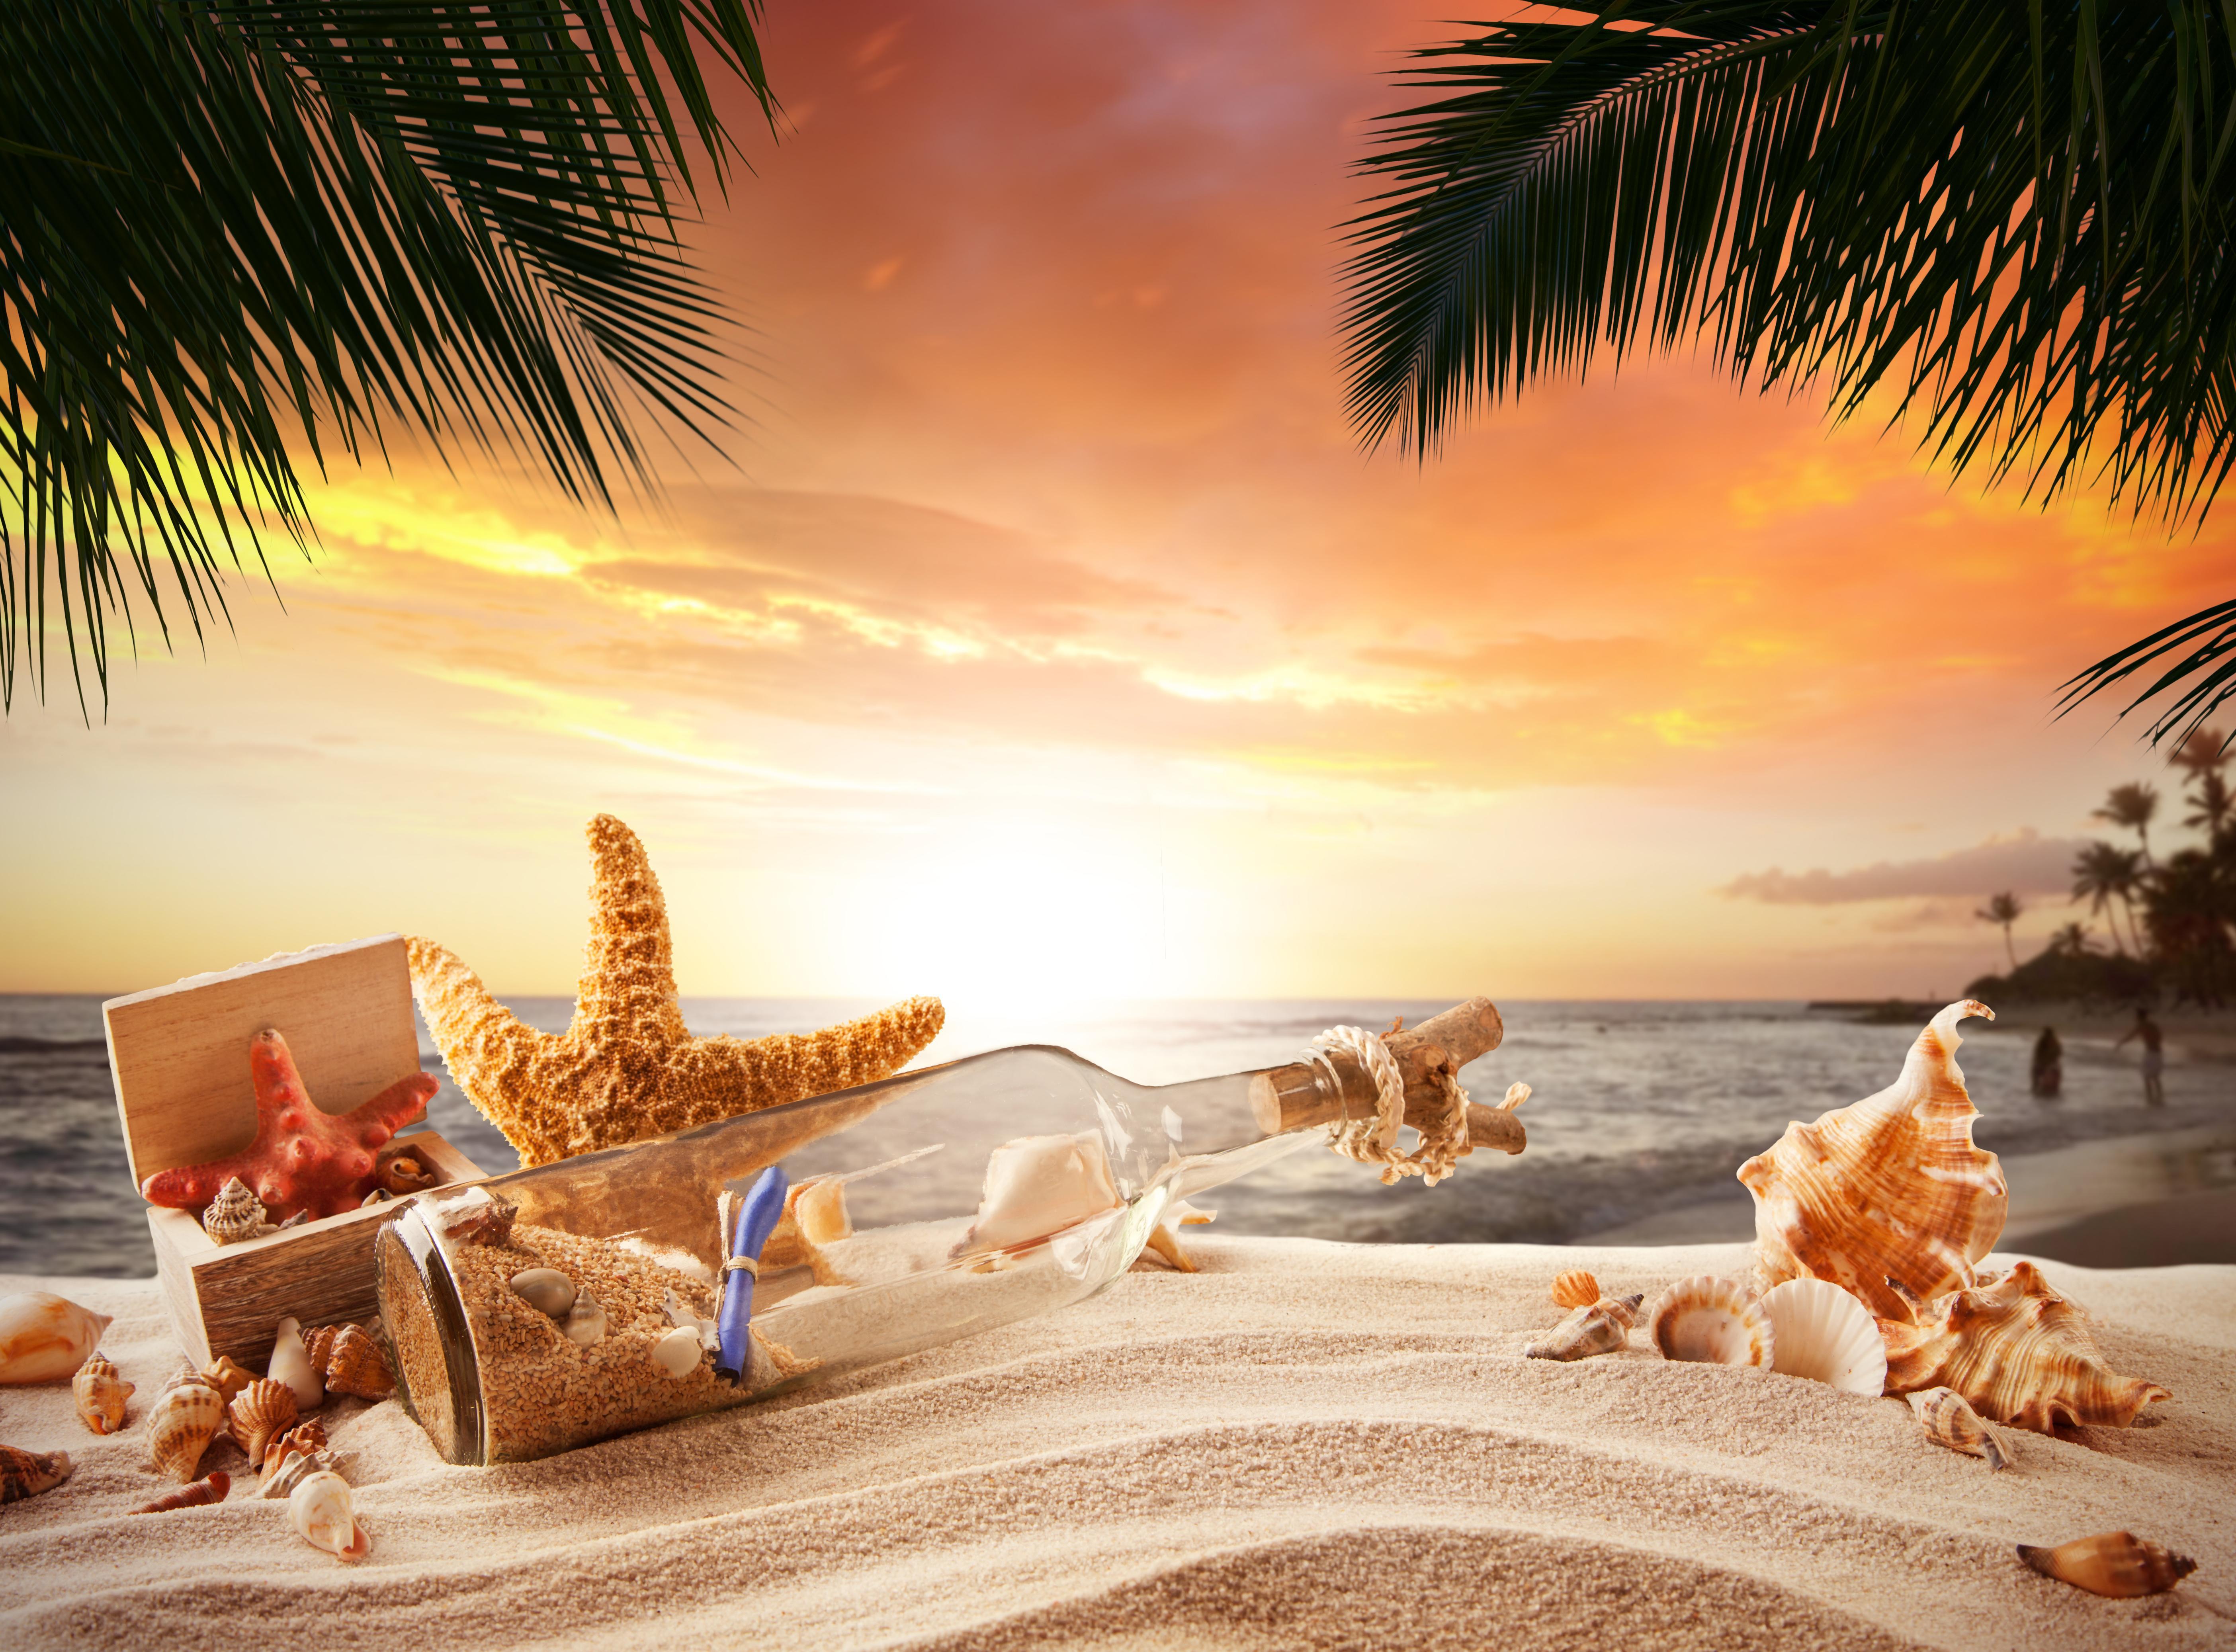 обои море, берег, бутылка, морская звезда картинки фото